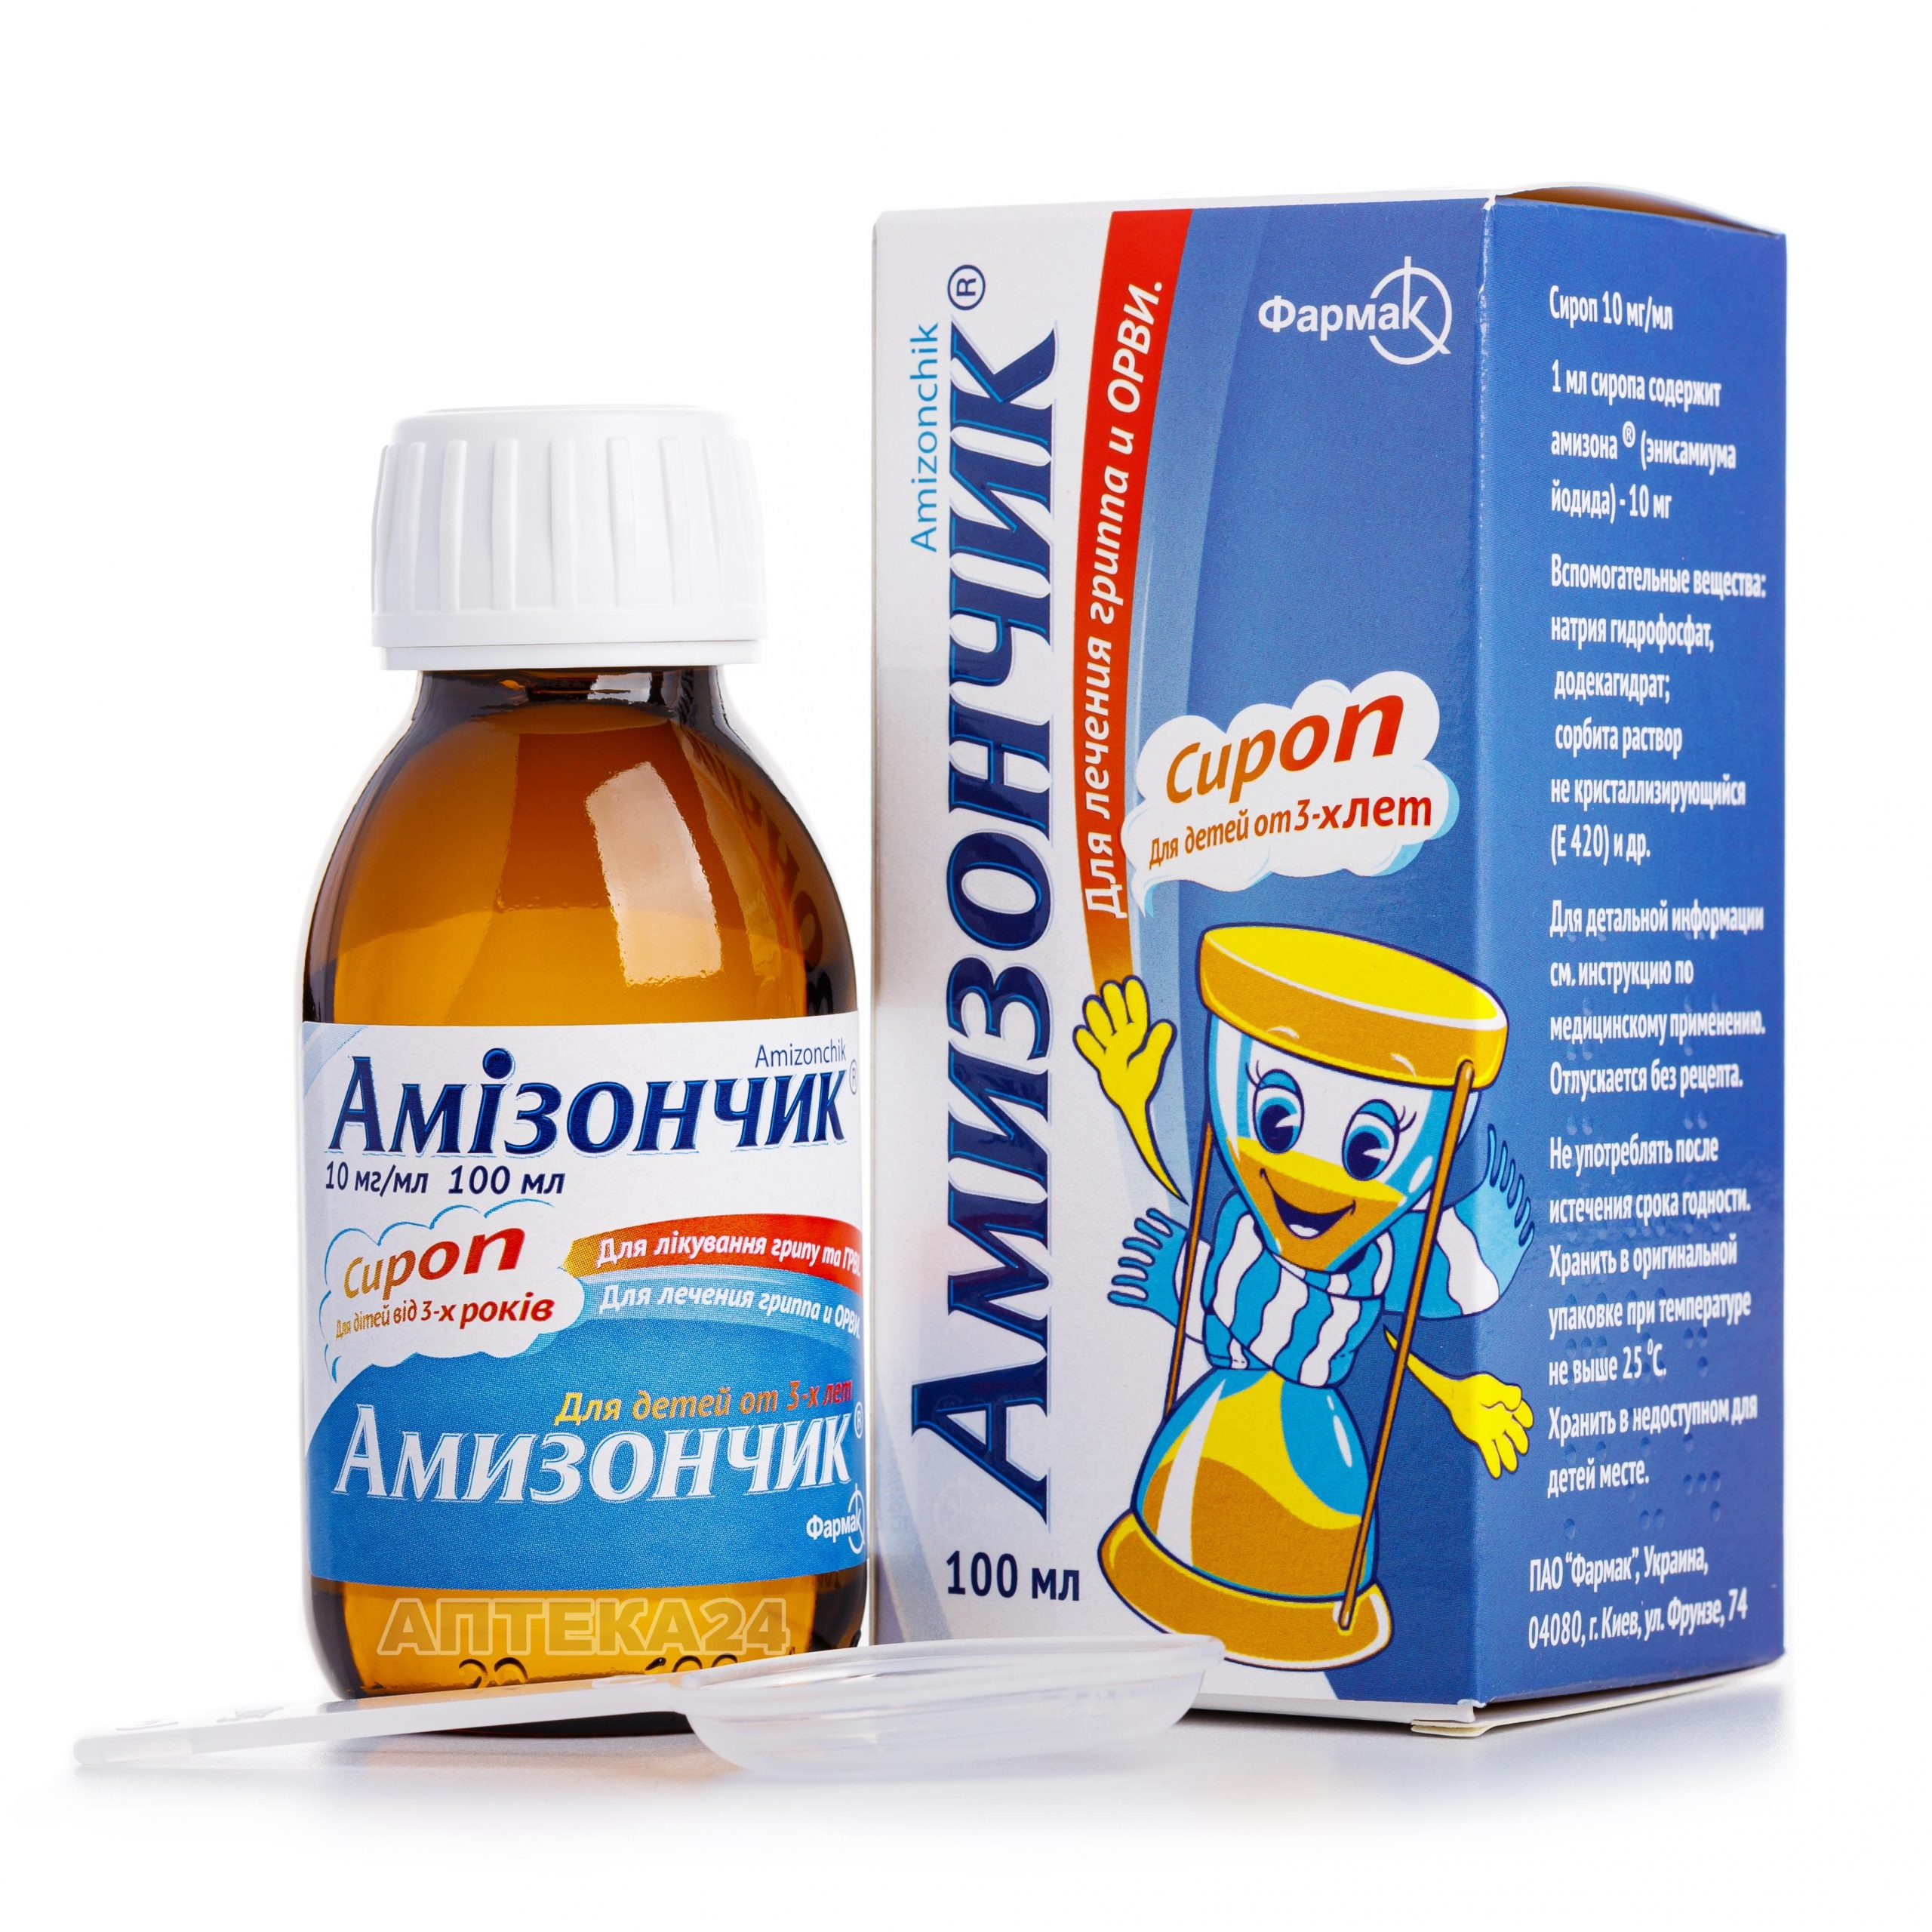 Амизончик 10 мг/мл 100 мл сироп для детей_60070f5a2d562.jpeg